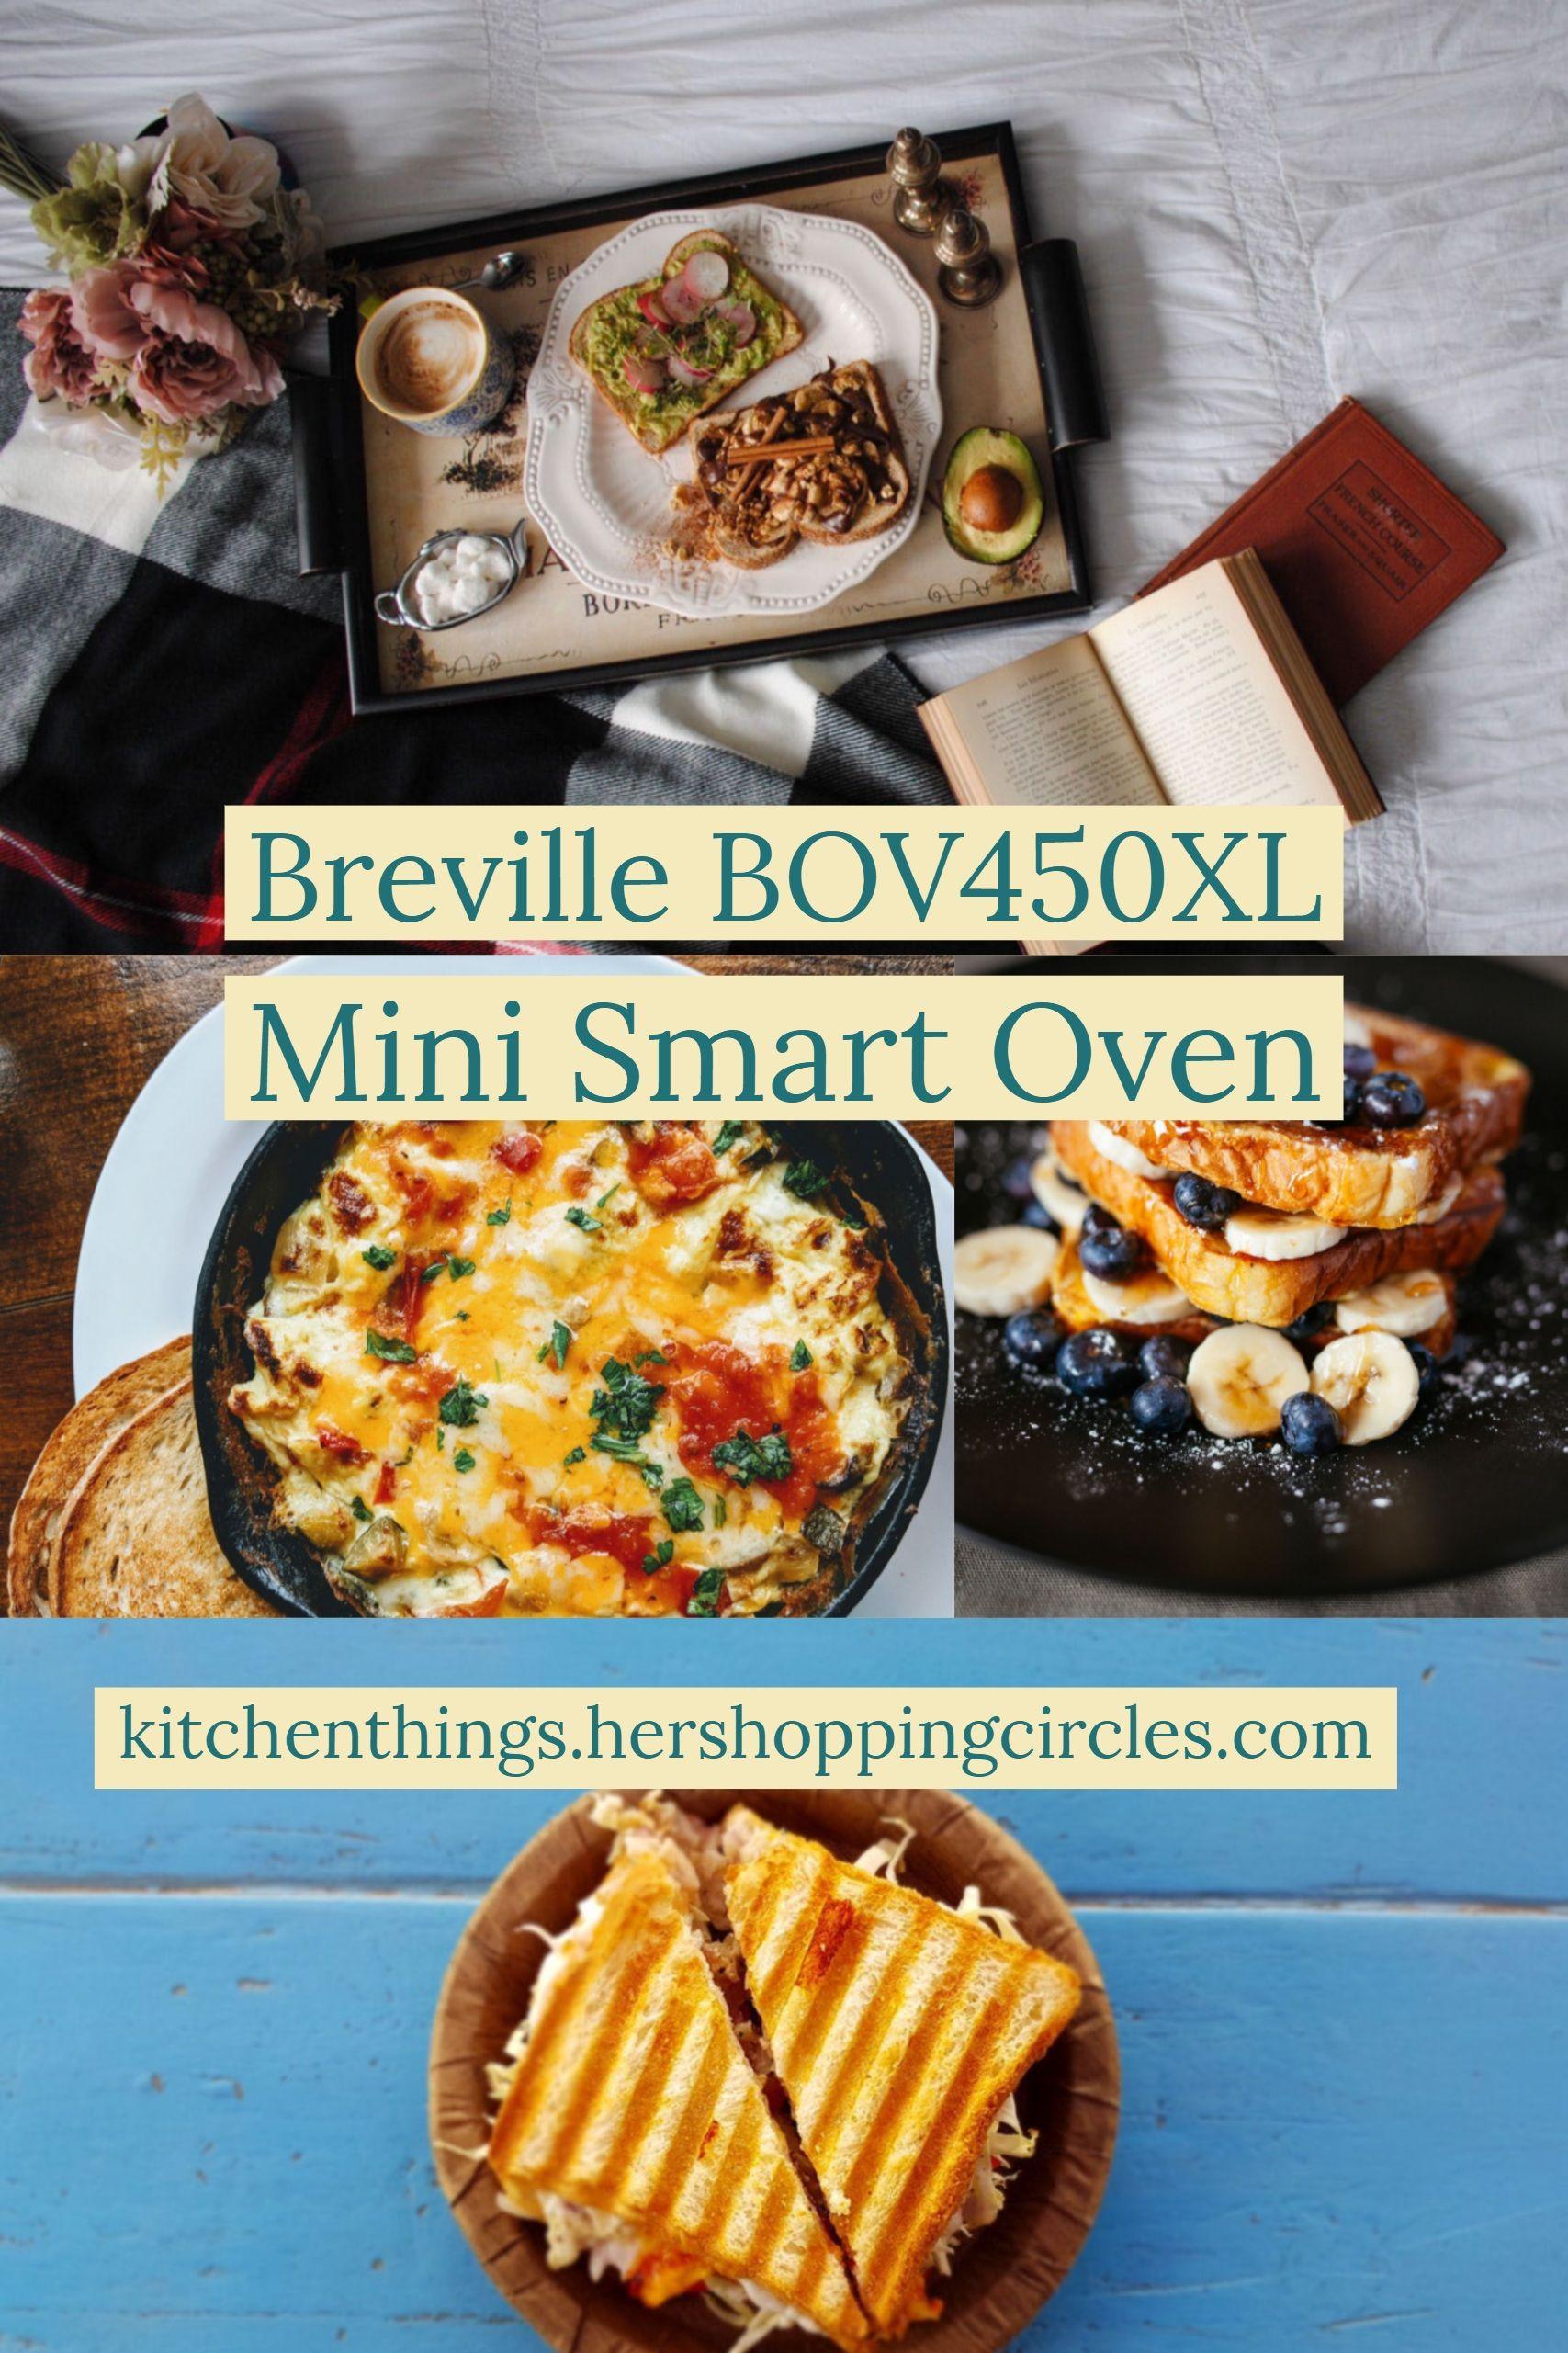 Breville Bov450xl Mini Smart Oven With Element Iq Smart Oven Countertop Oven Oven